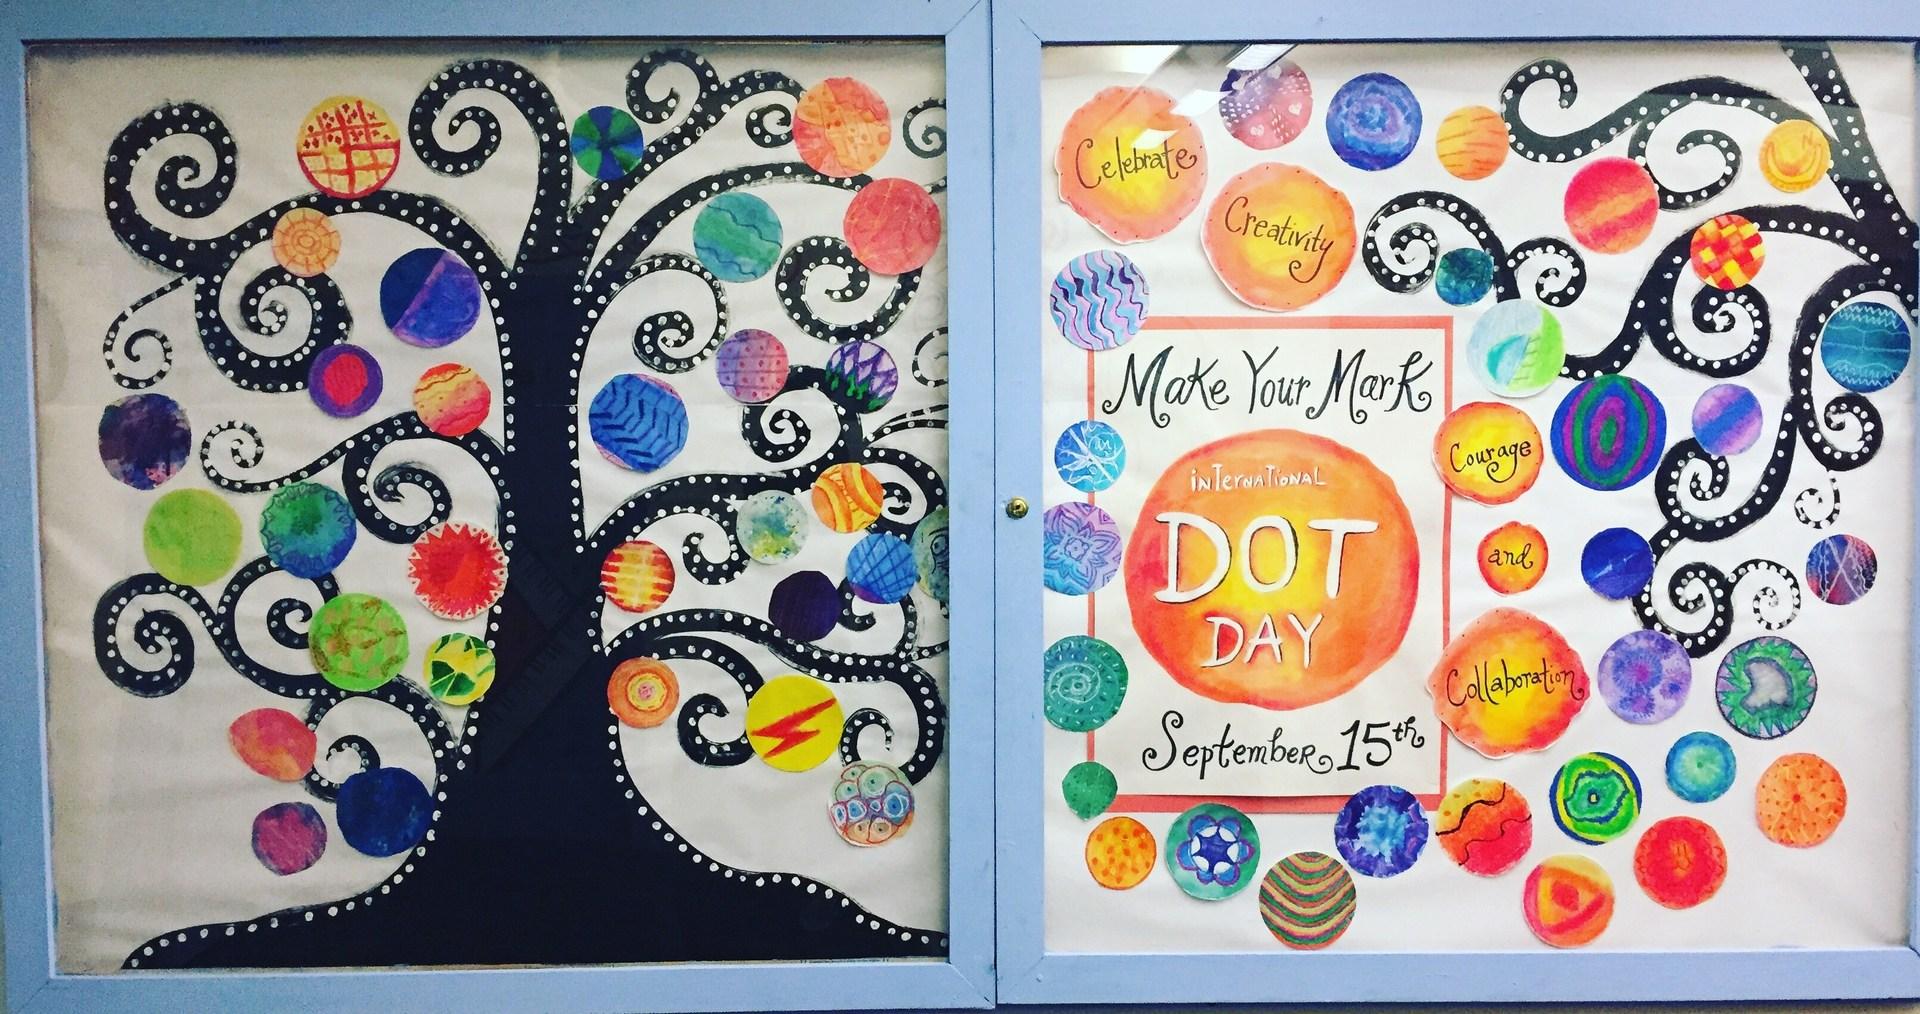 Celebrating International Dot Day